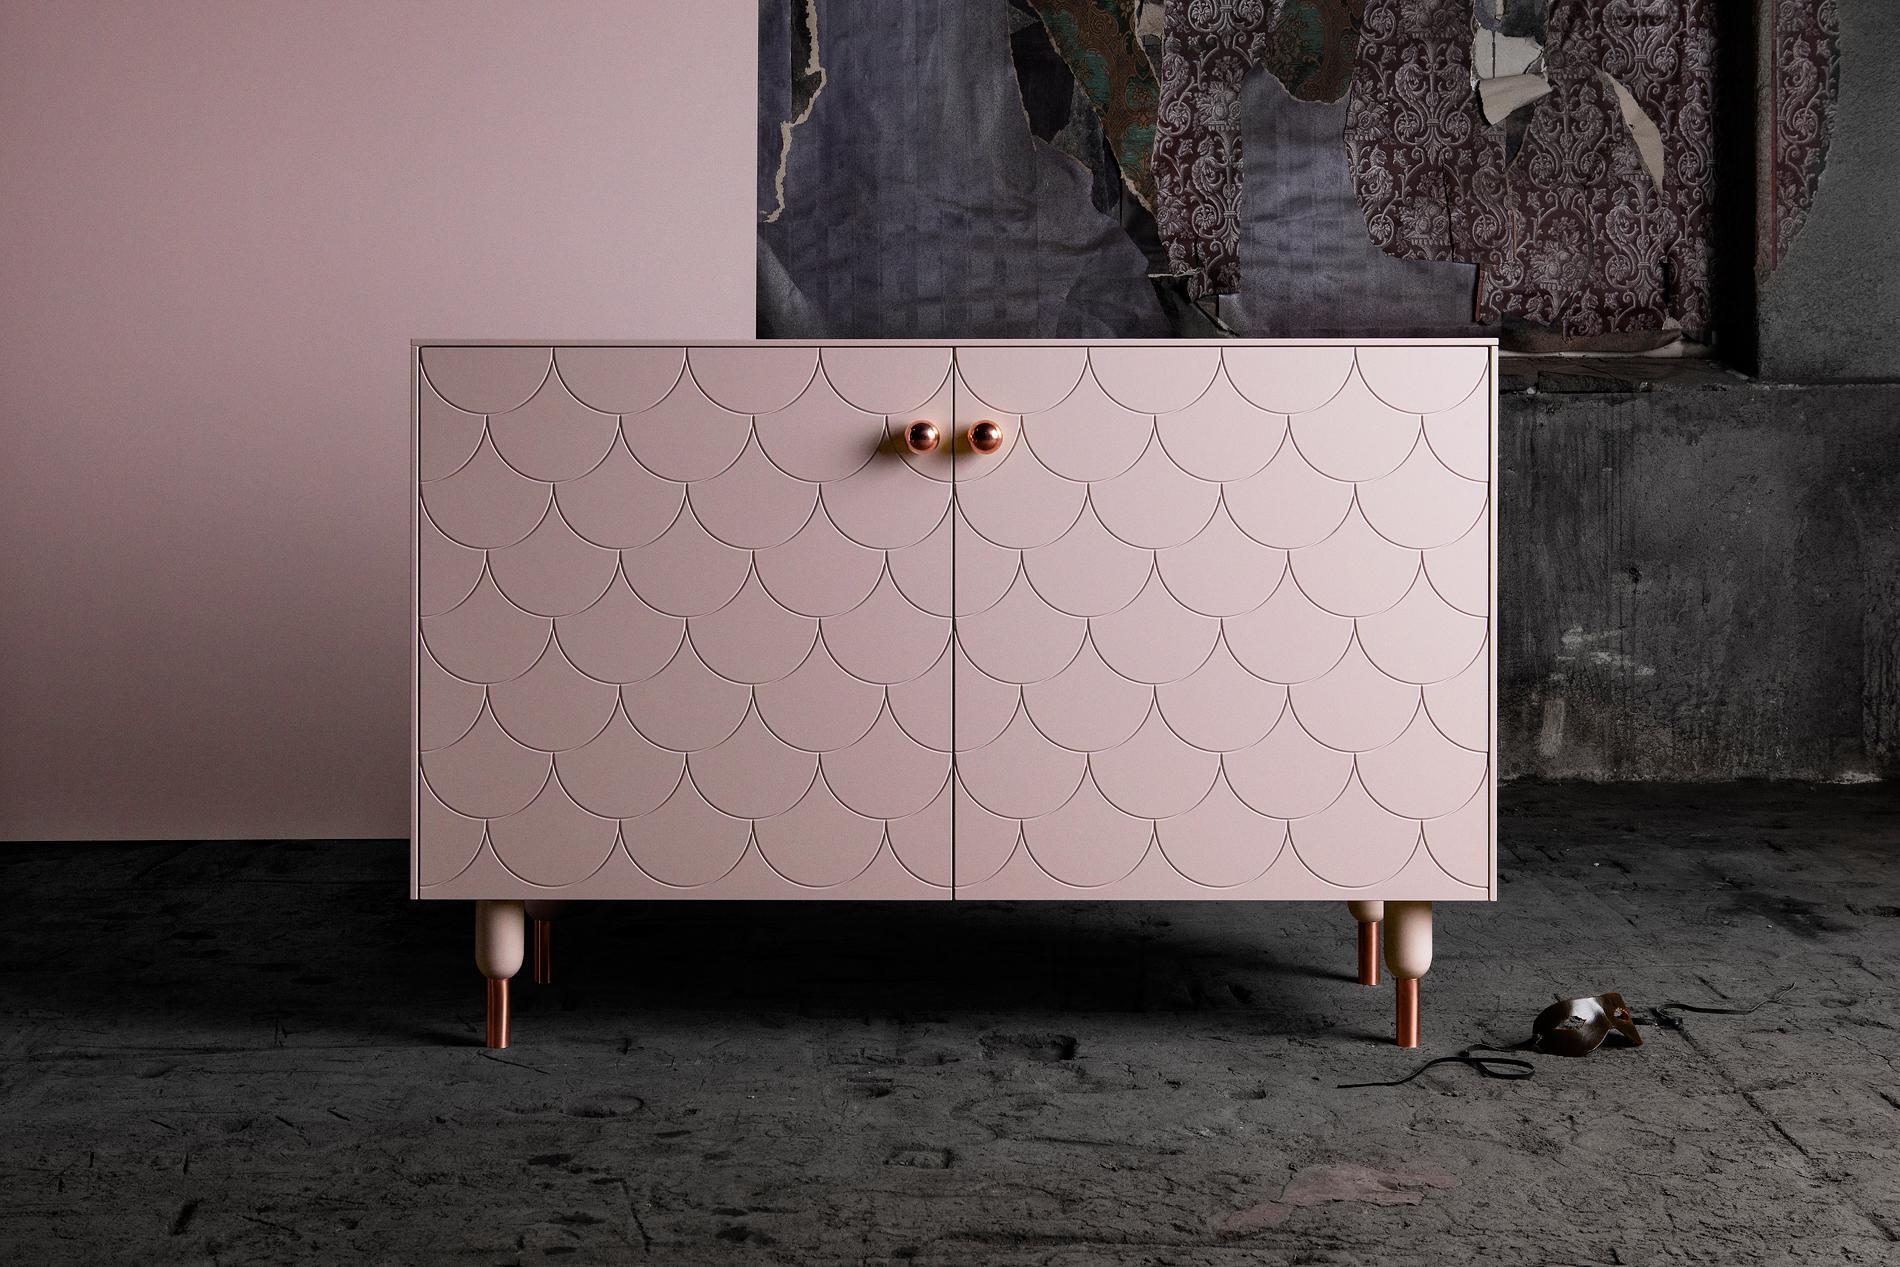 dix conseils pour customiser ses meubles ikea madame figaro. Black Bedroom Furniture Sets. Home Design Ideas